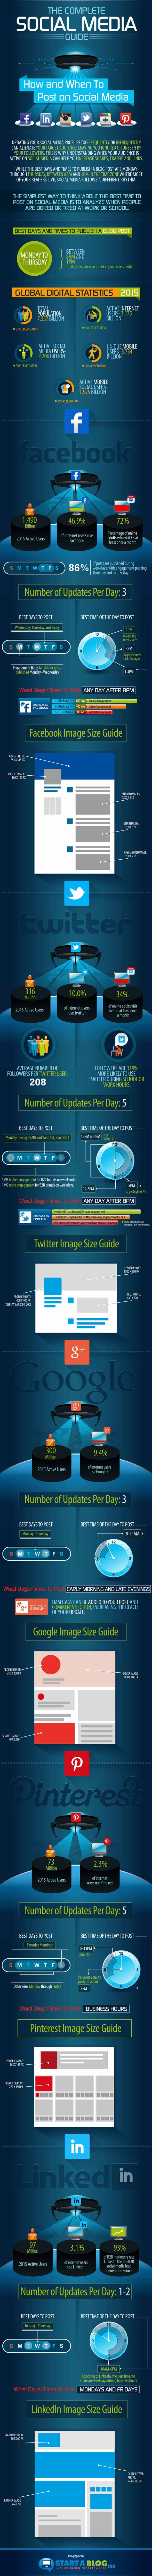 StartABlog123 - Best Times To Post on Social Media